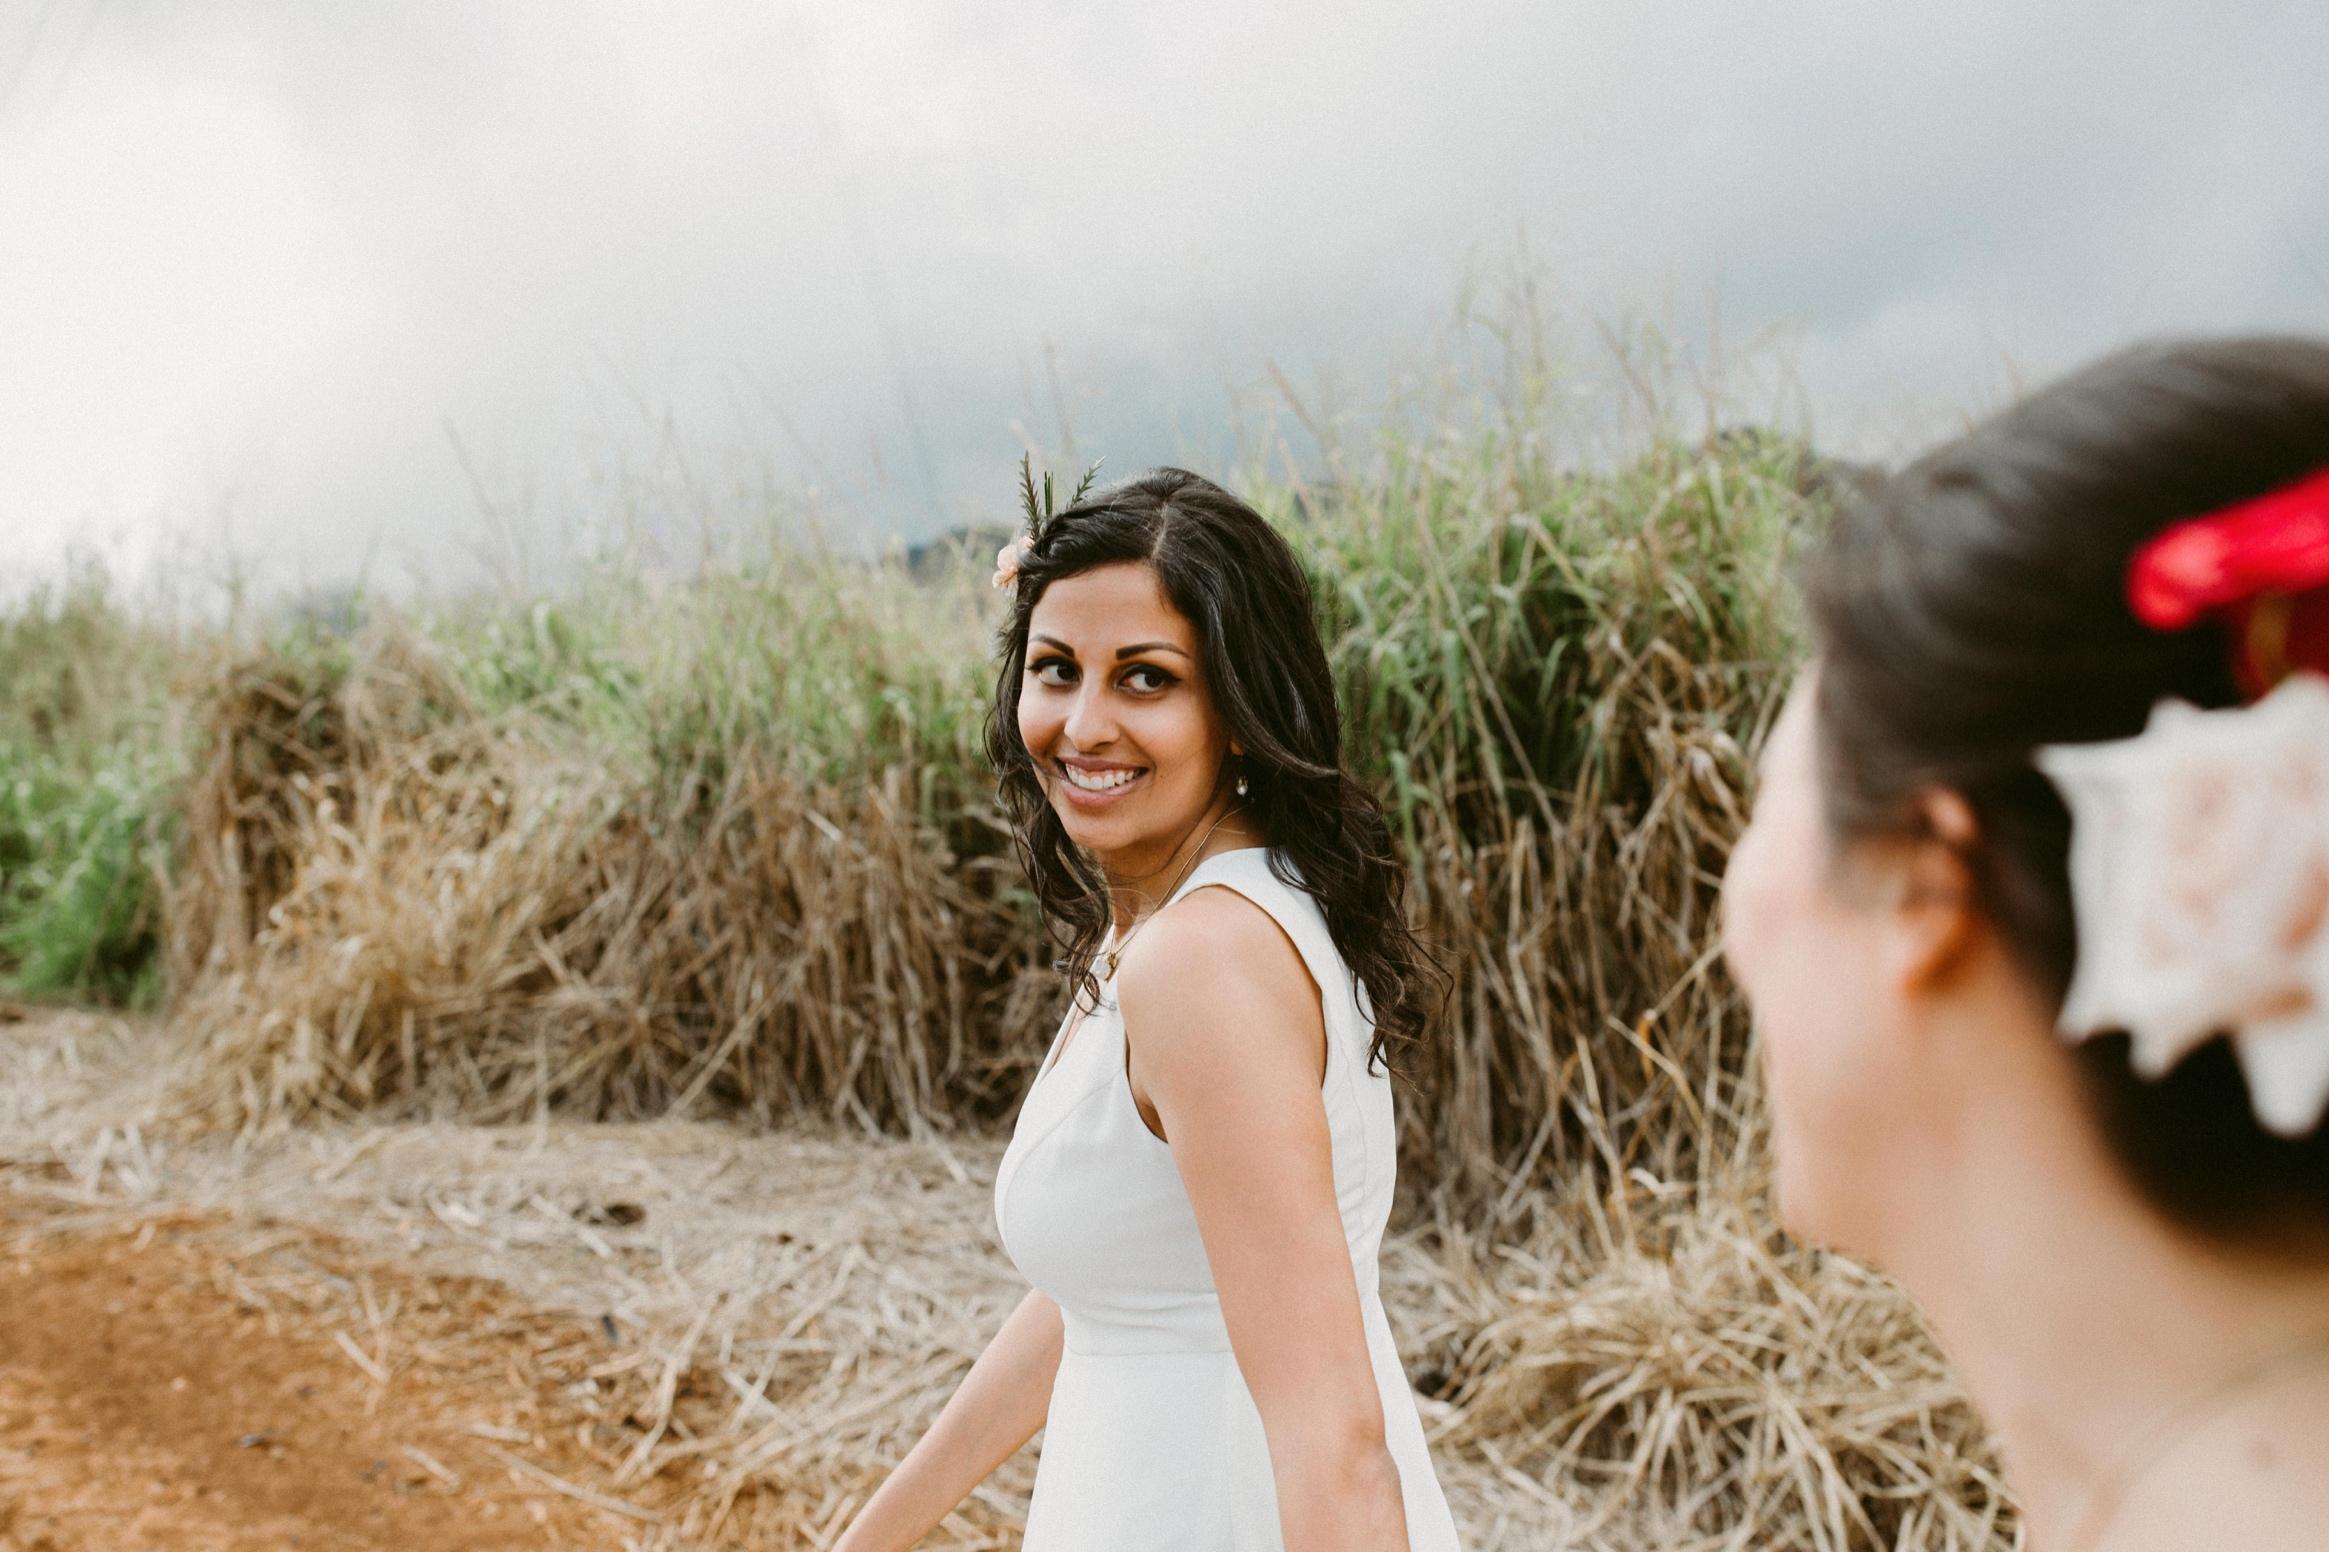 24_Oahu Hawaii Wedding  (89 of 294)_Oahu_sex_Hawaii_same_wedding_elopement_photographer.jpg